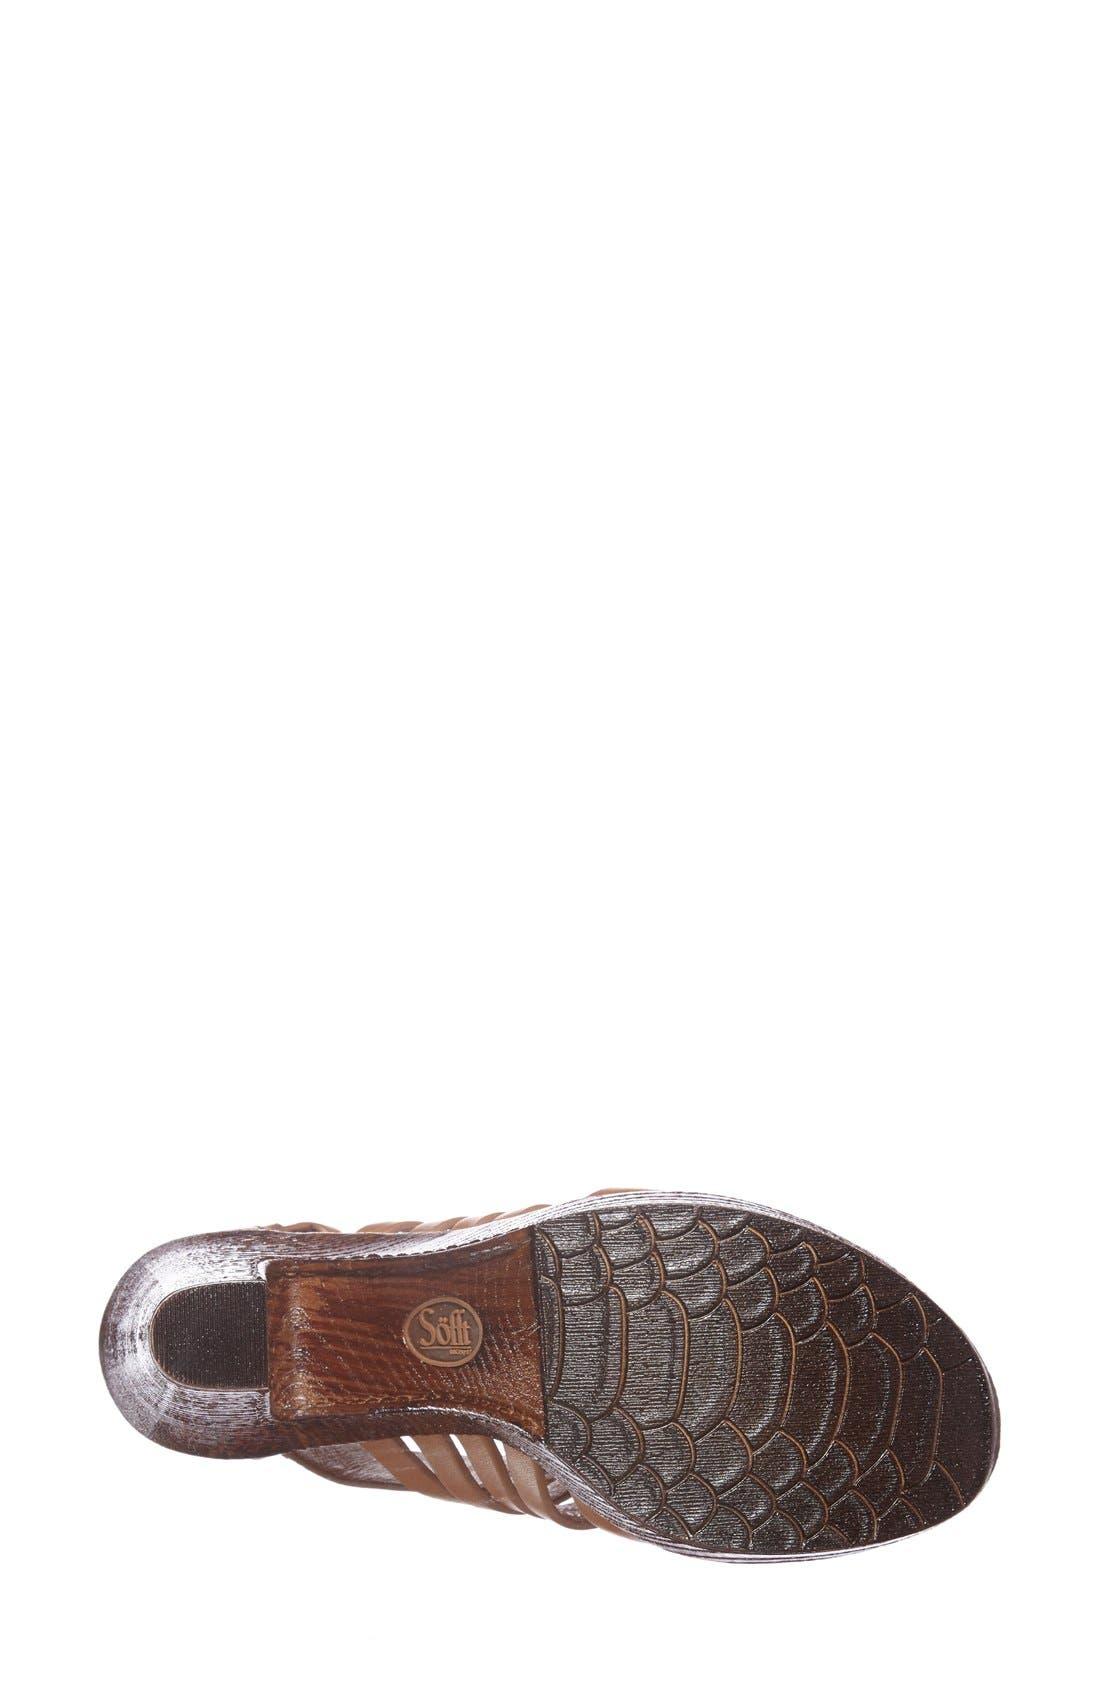 'Ohanna' Leather Sandal,                             Alternate thumbnail 4, color,                             Luggage